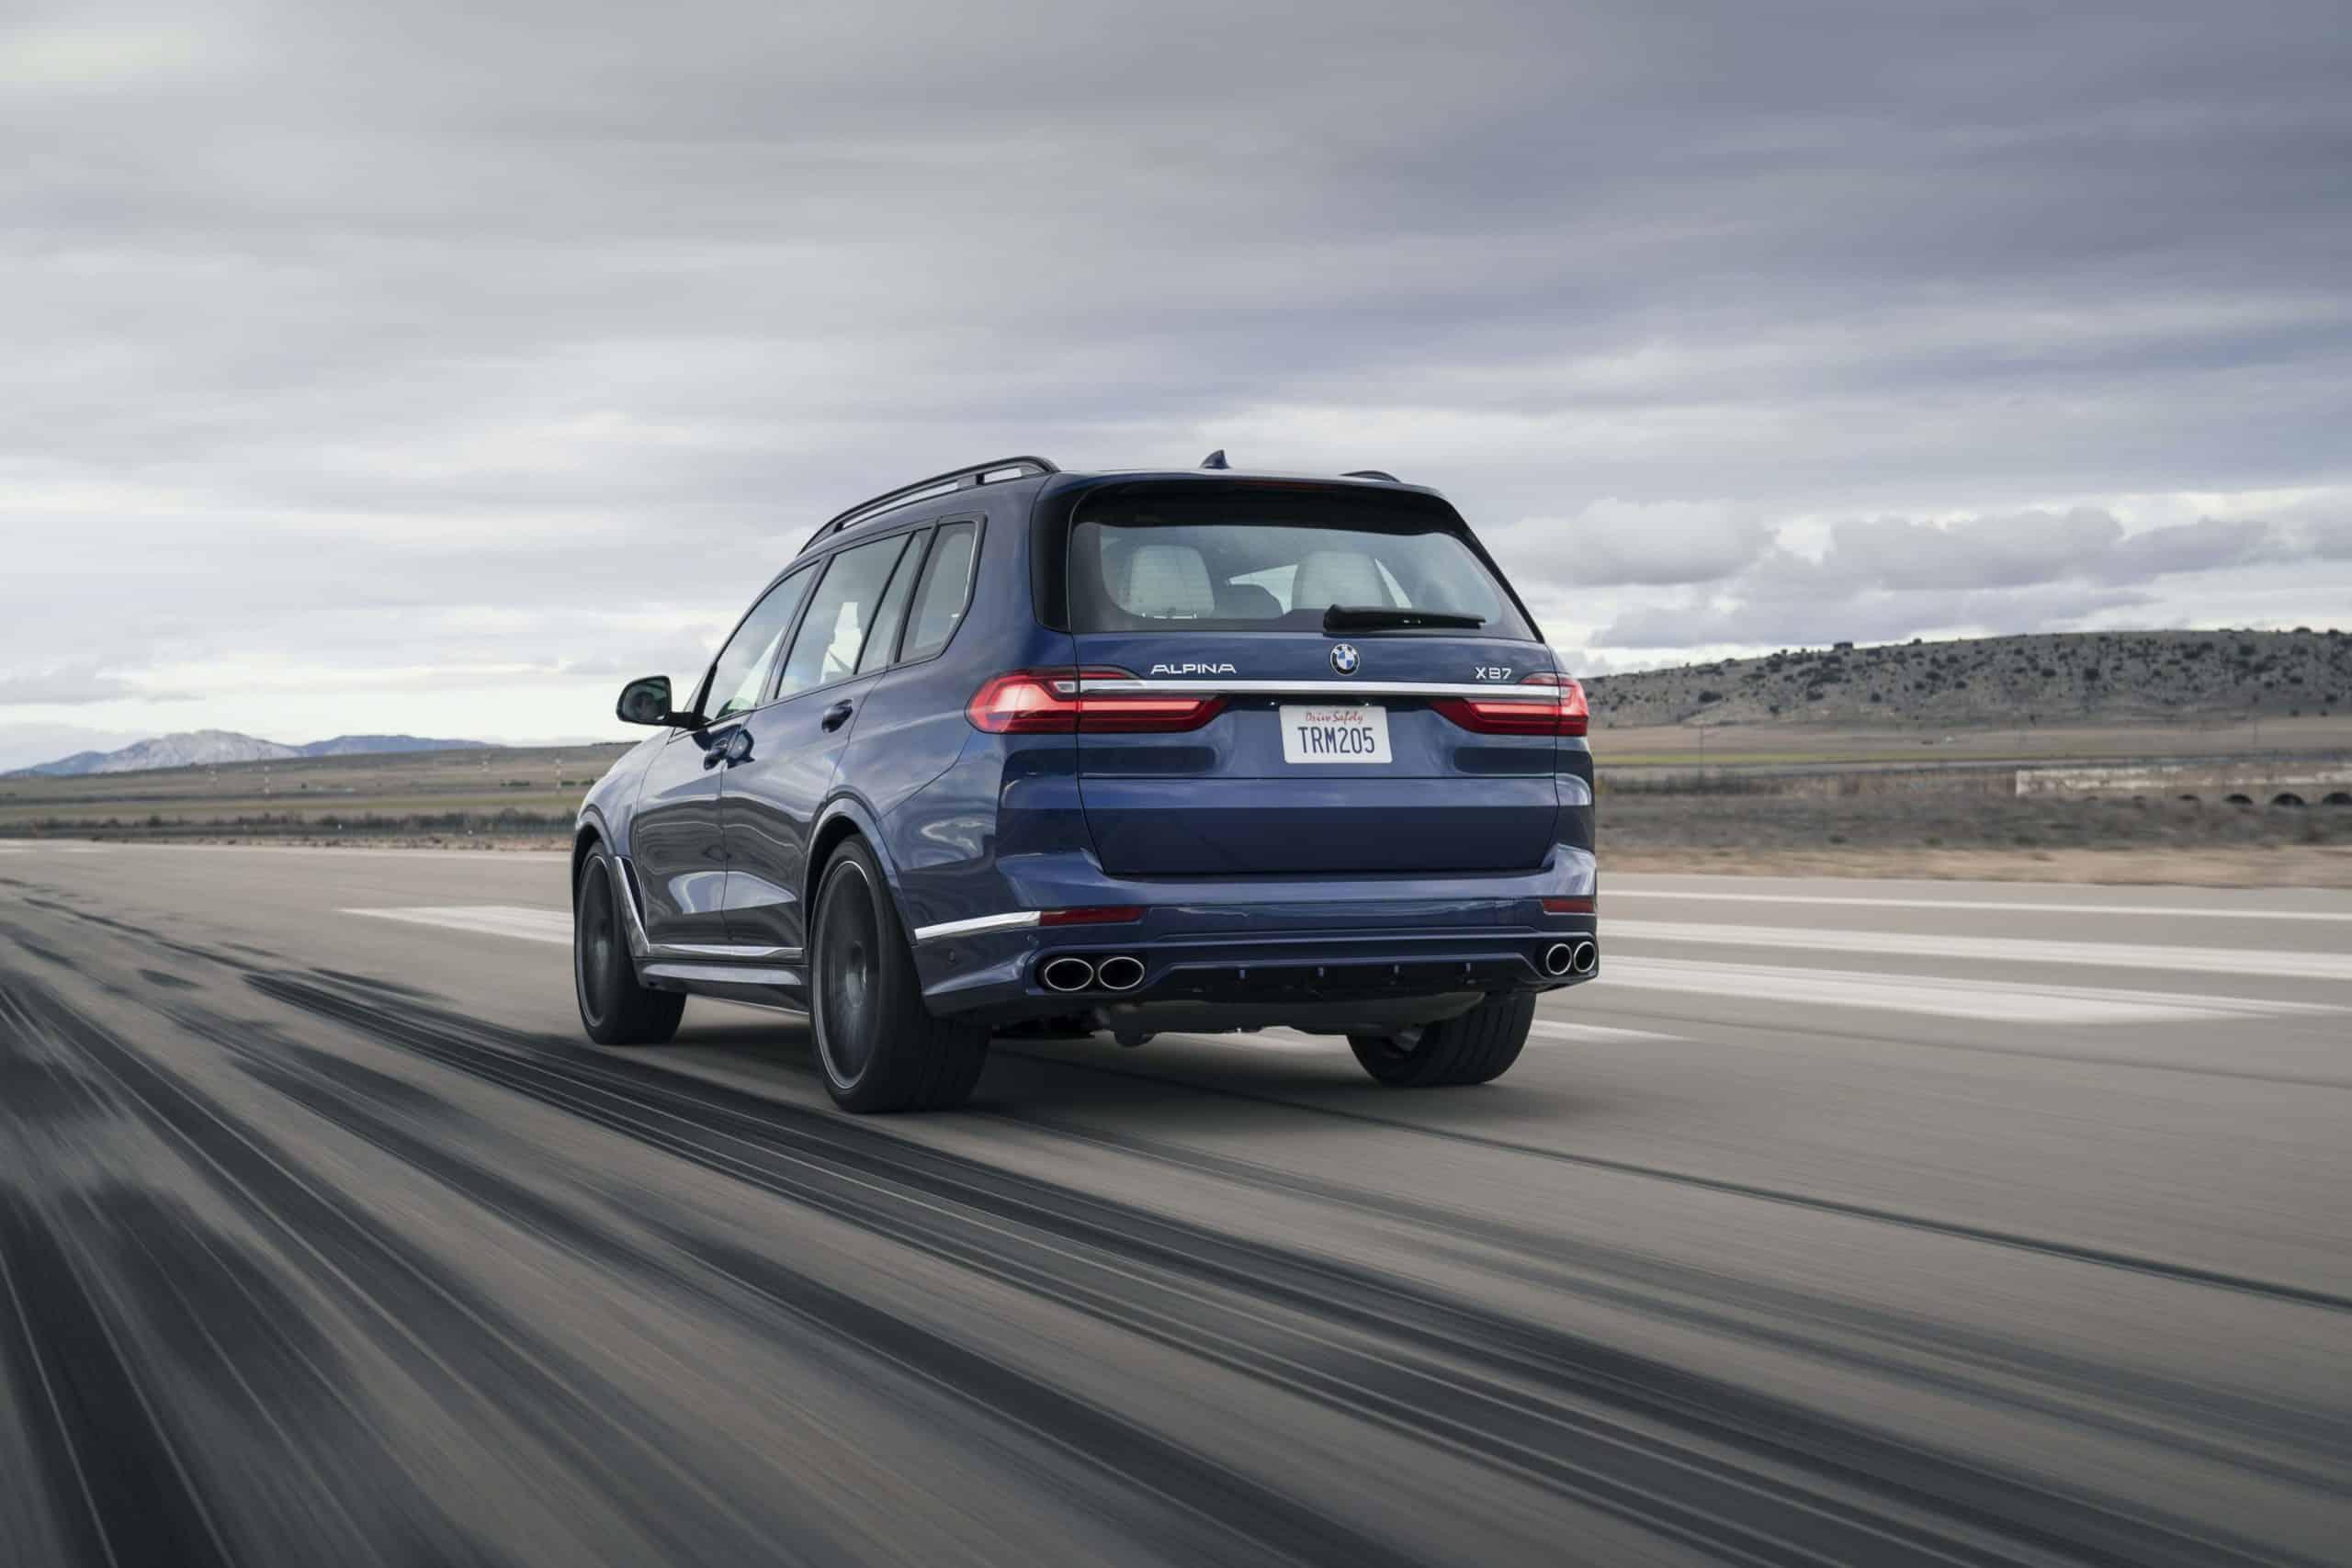 2021 BMW Alpina XB7 rear three quarter rolling shot